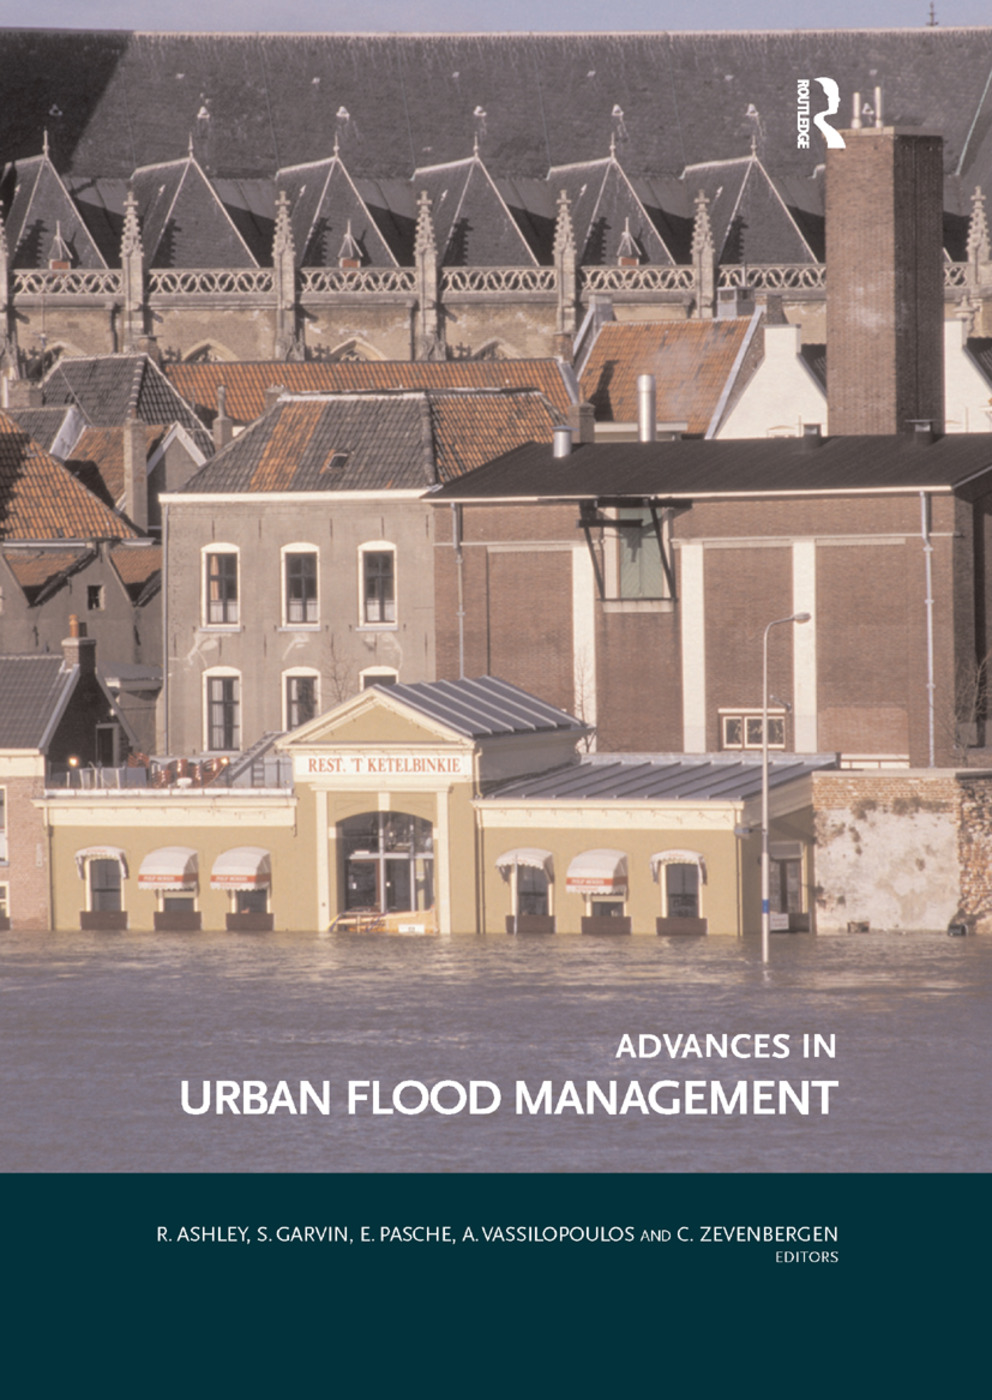 Hydrological Modelling of Floods